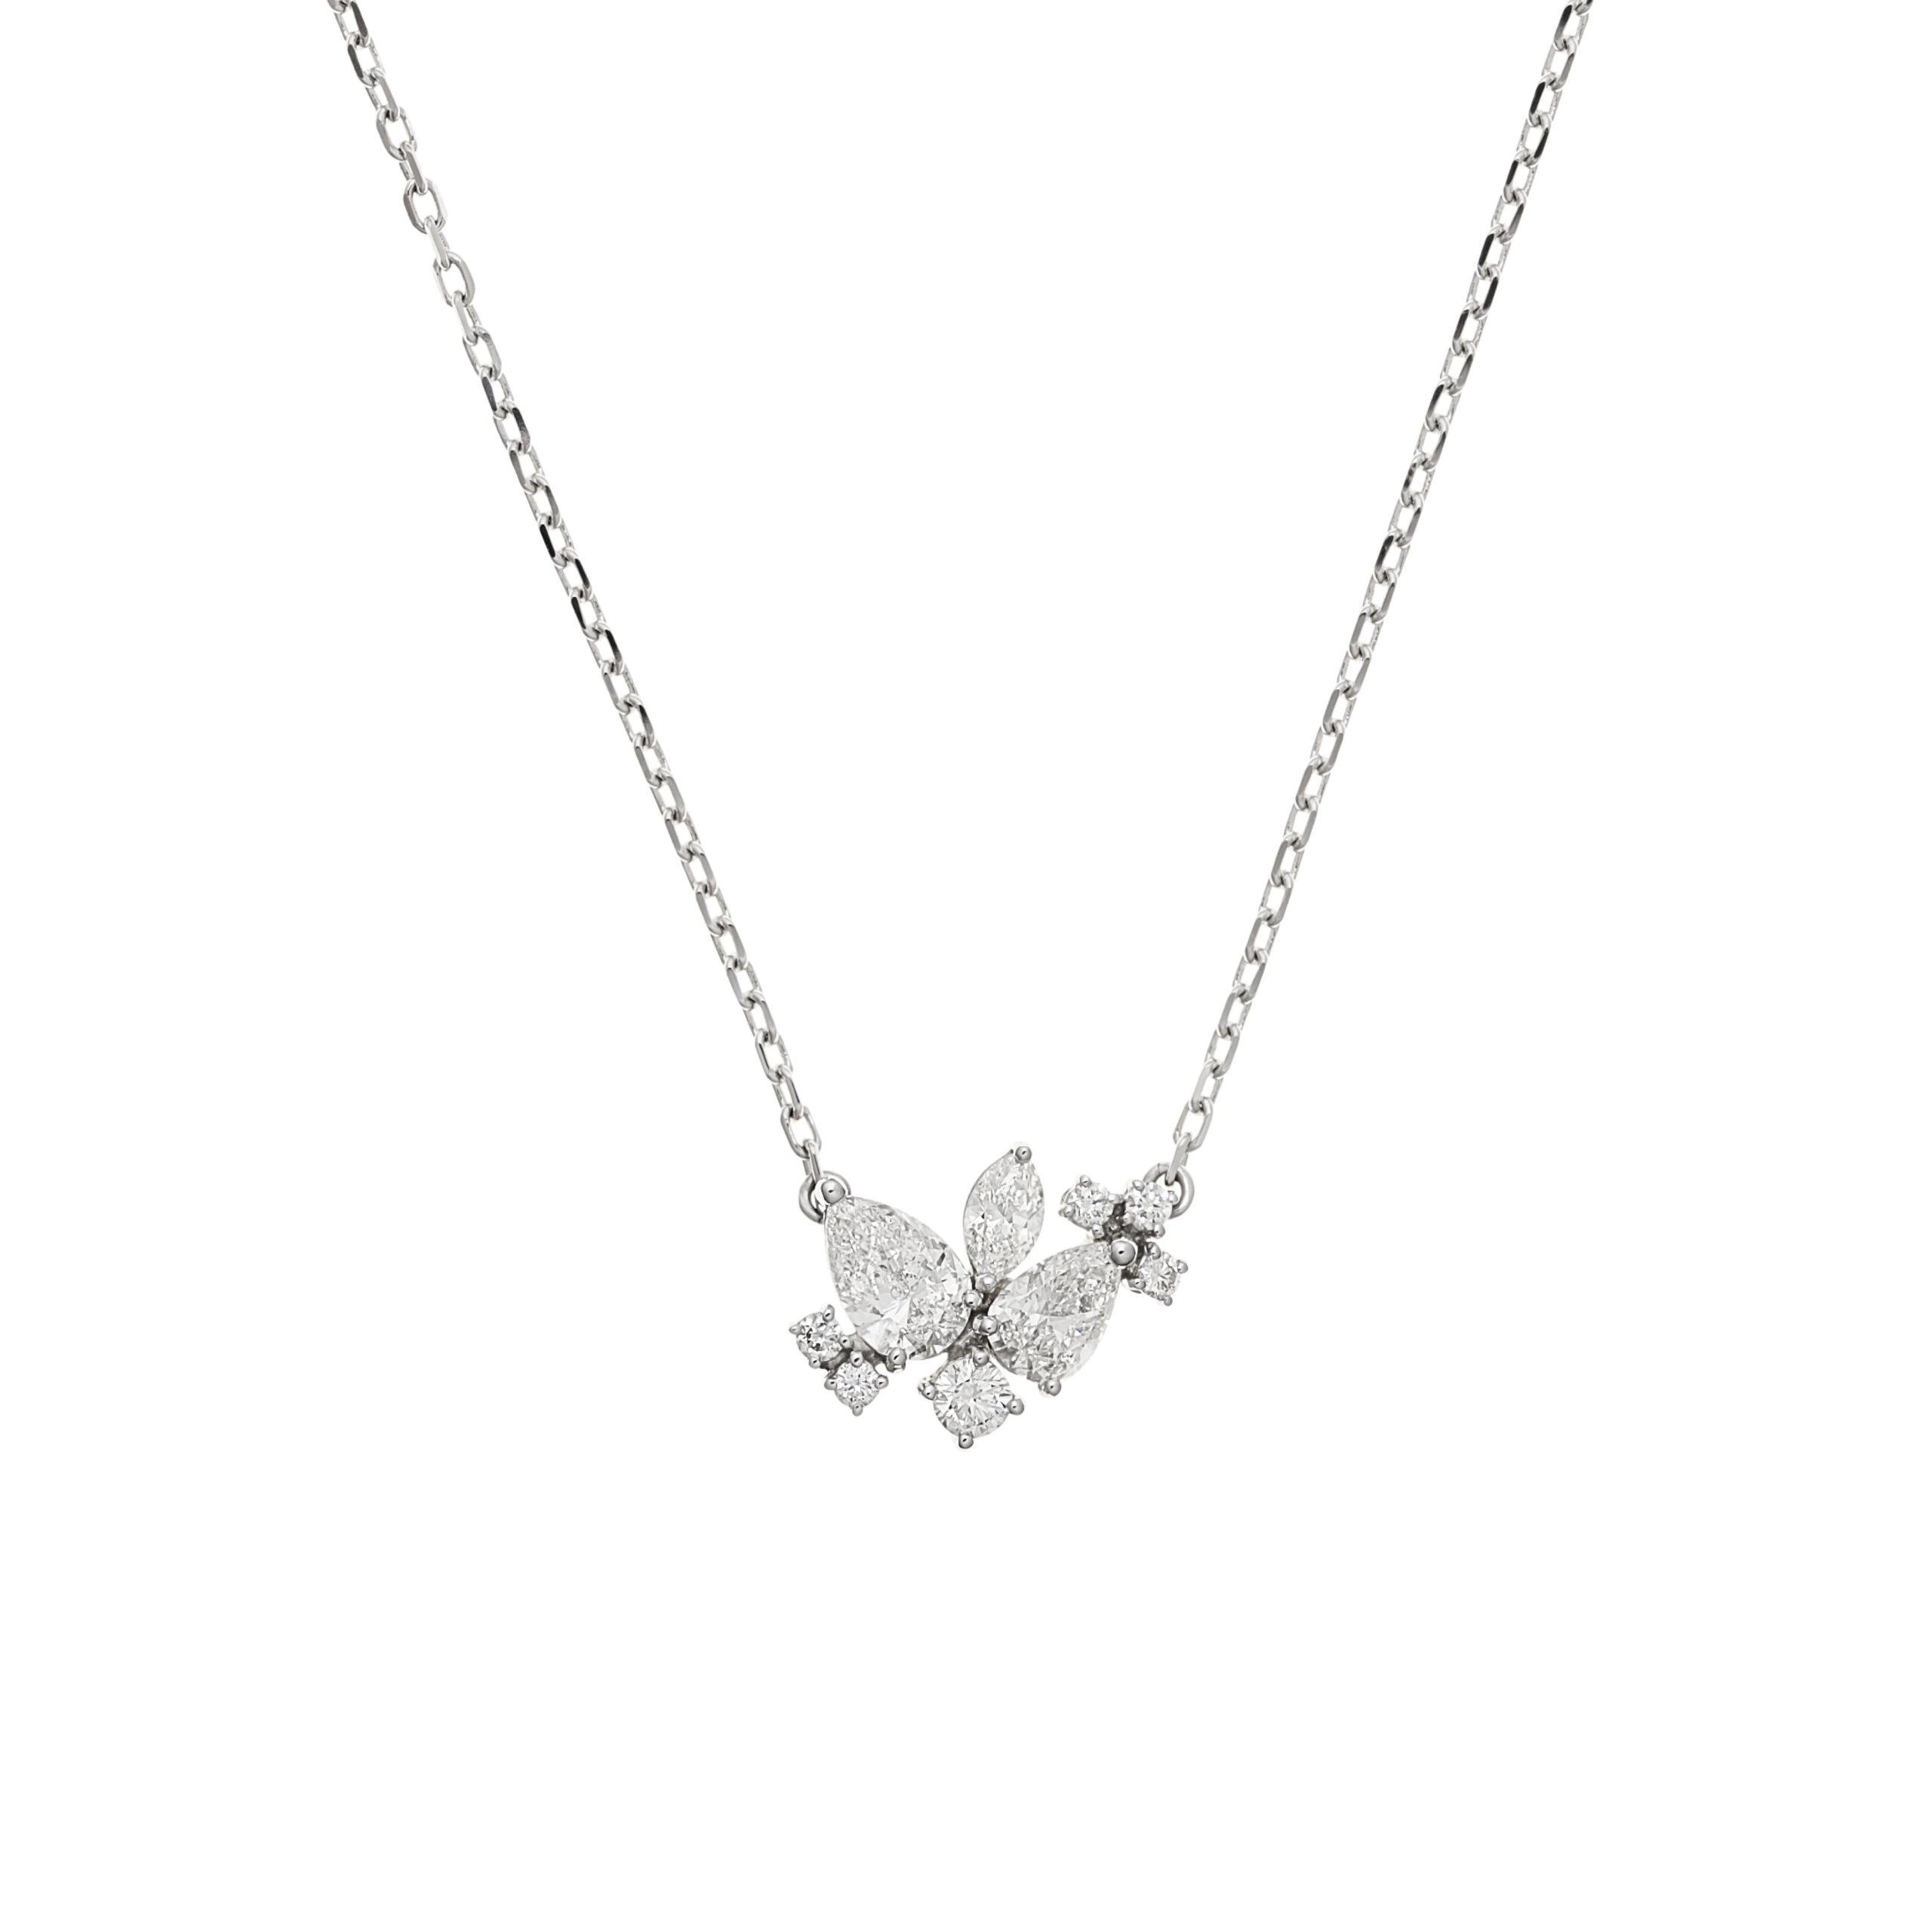 Felicity Bundle Necklace